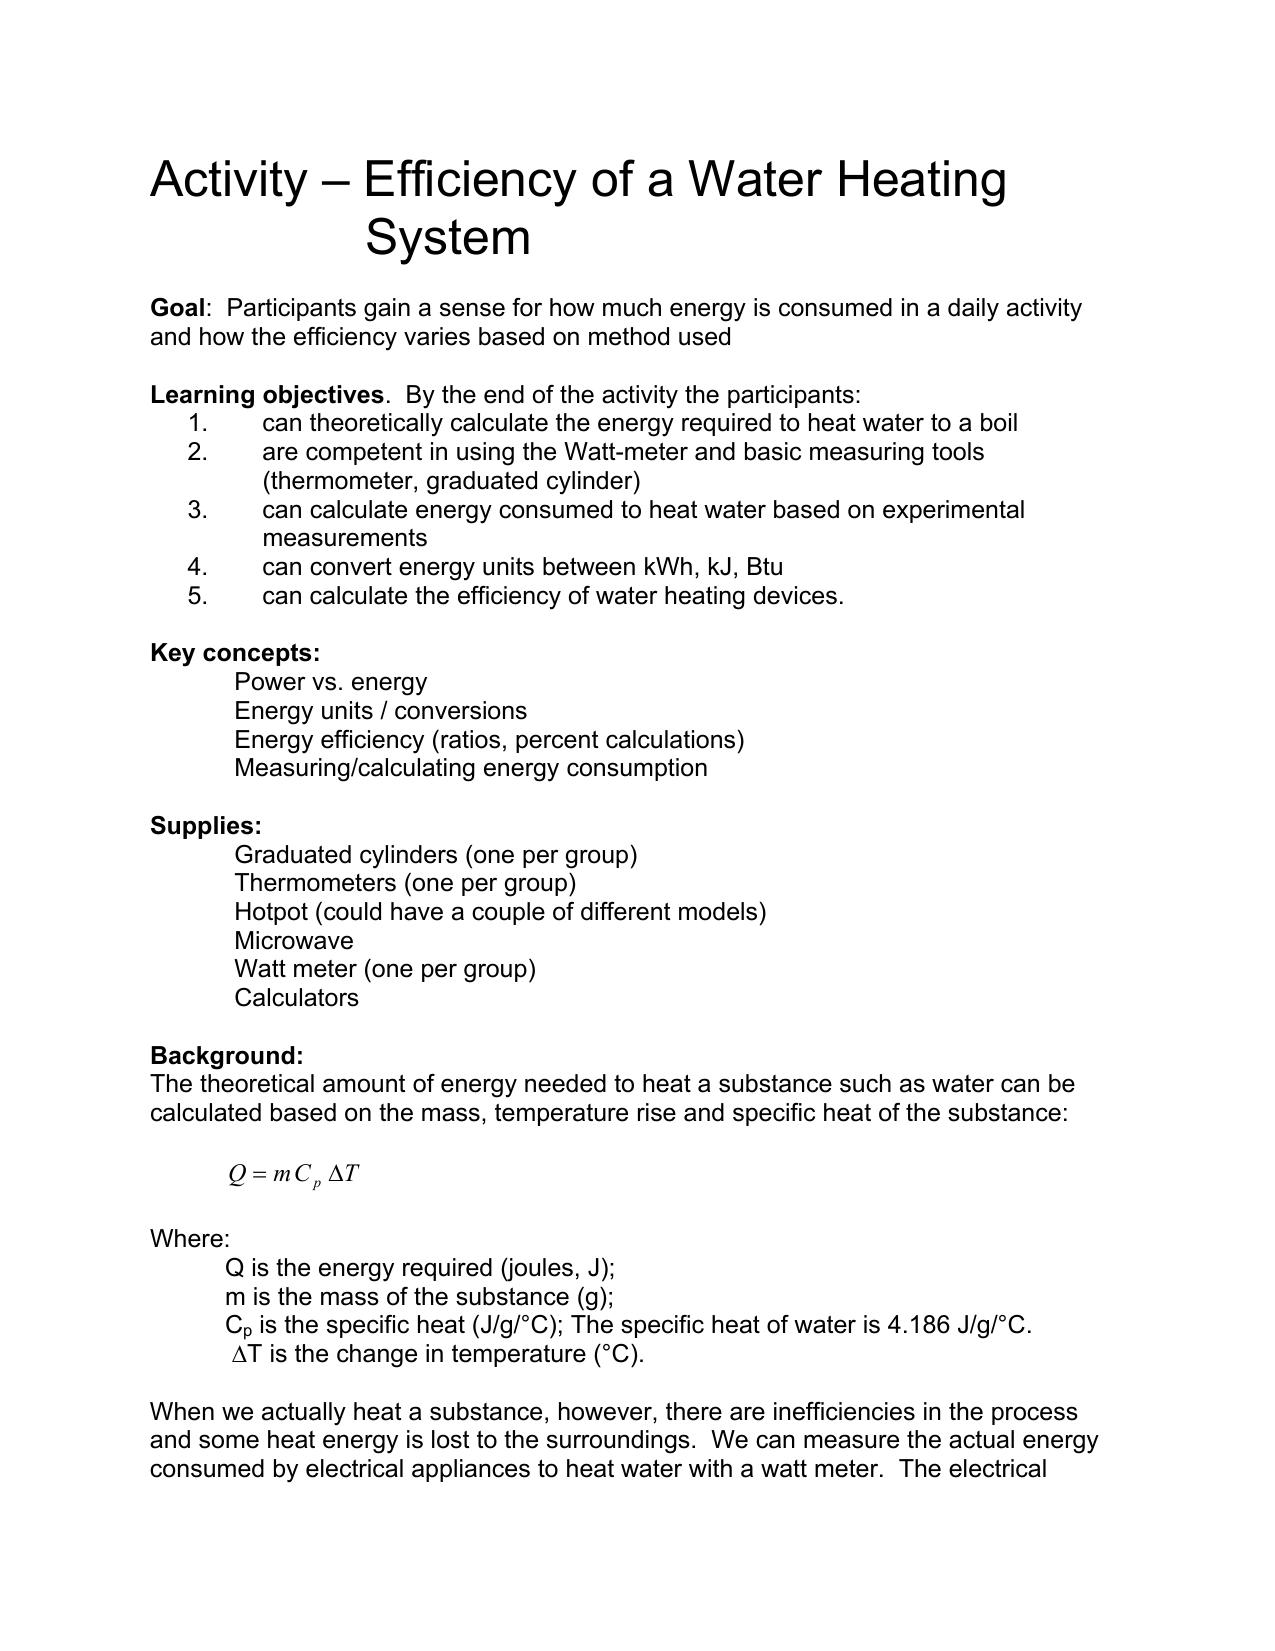 efficiency heating activity2 student worksheet